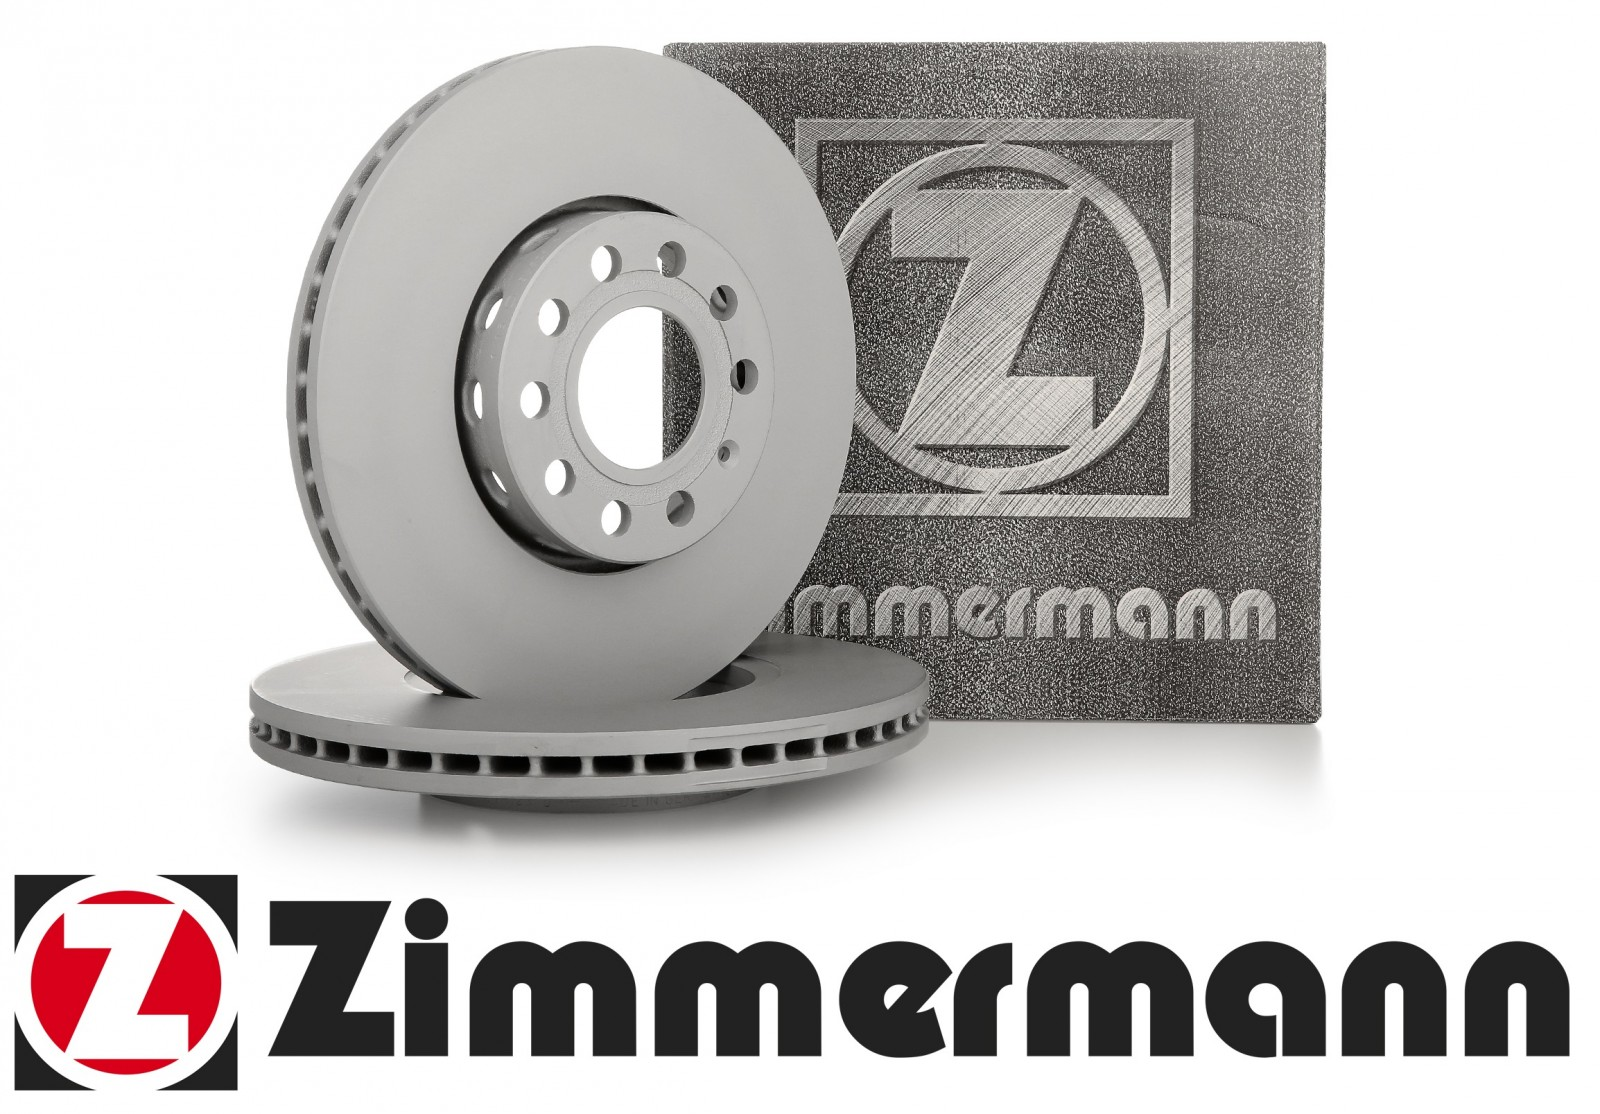 диски zimmermann mercedes s 63 w221 cl 63 amg 390